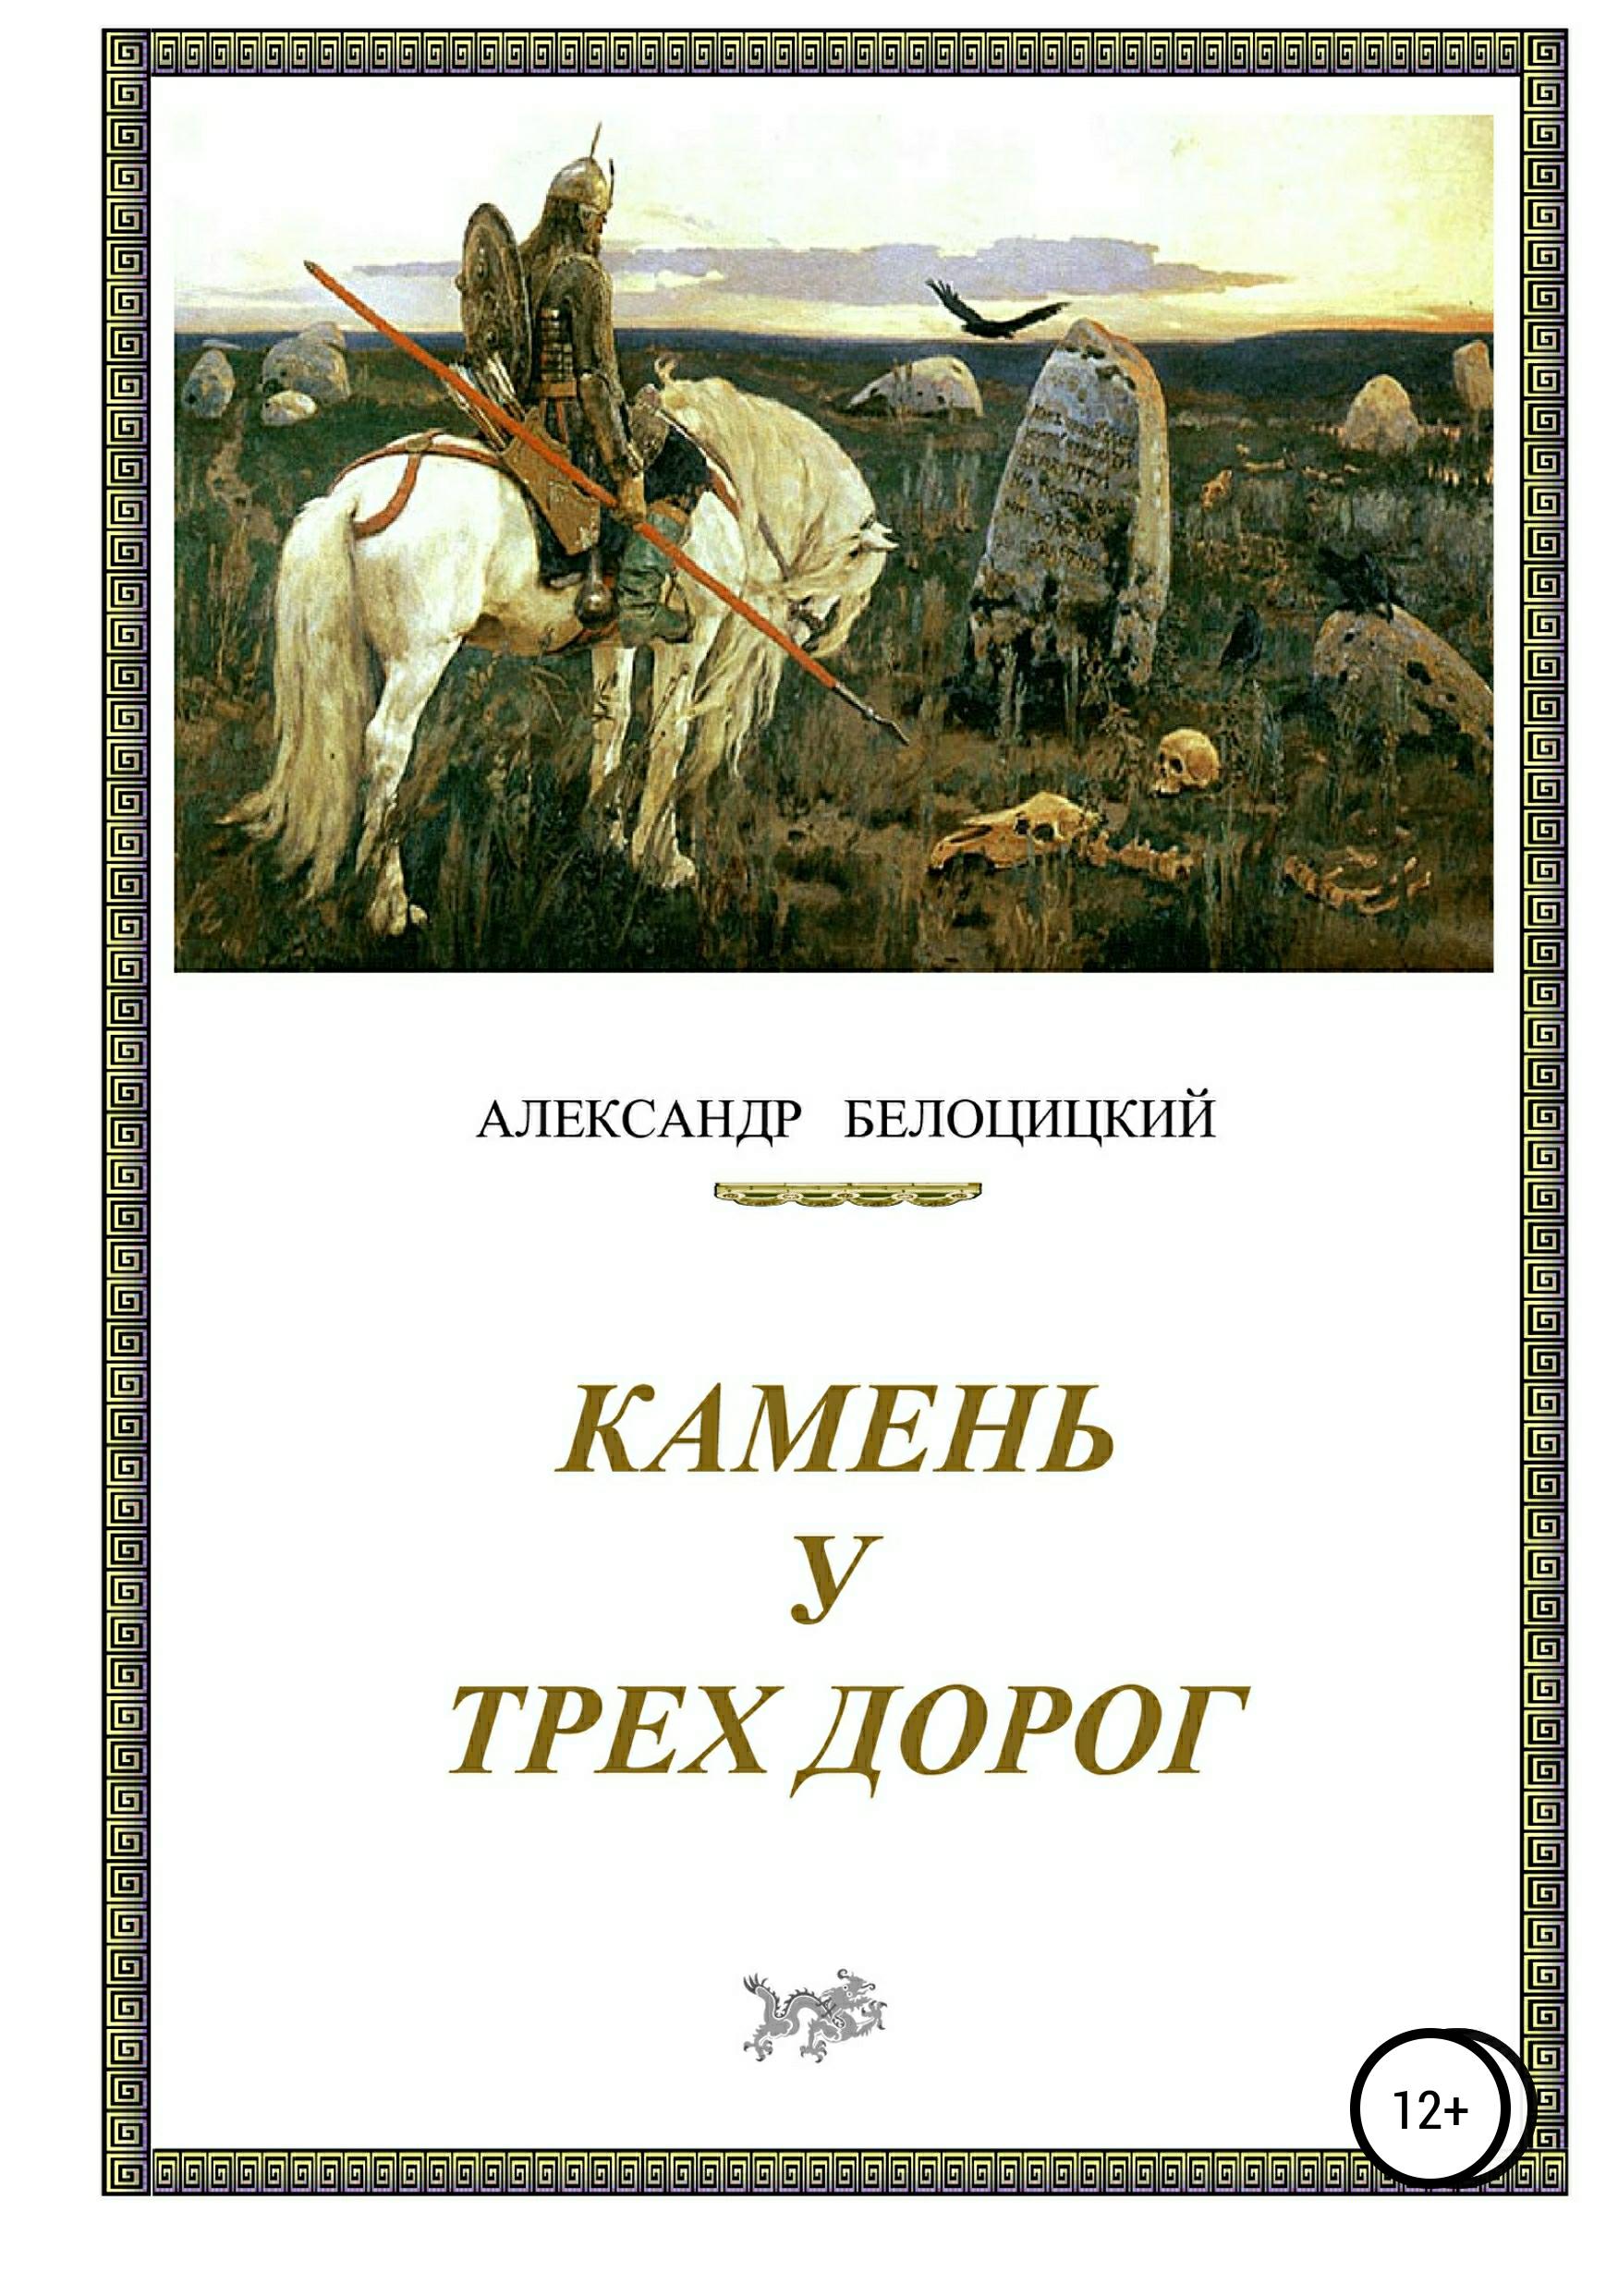 Александр Николаевич Белоцицкий Камень у трёх дорог